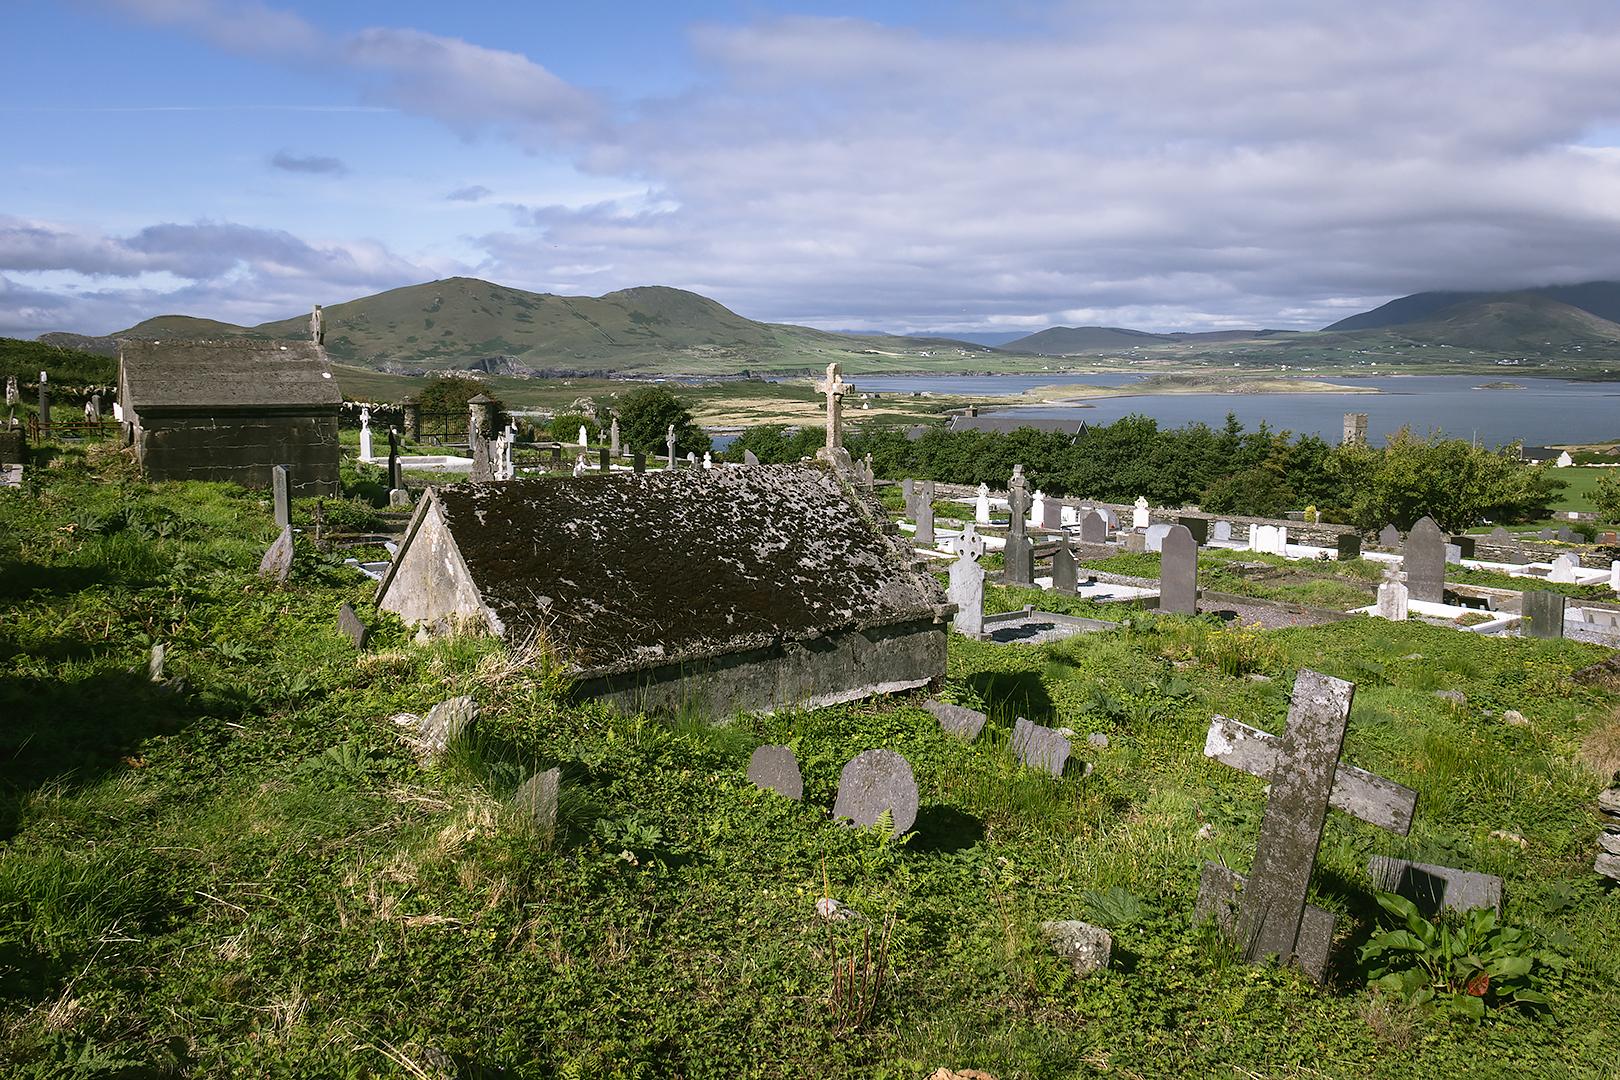 Kylemore burial ground, Valentia Island